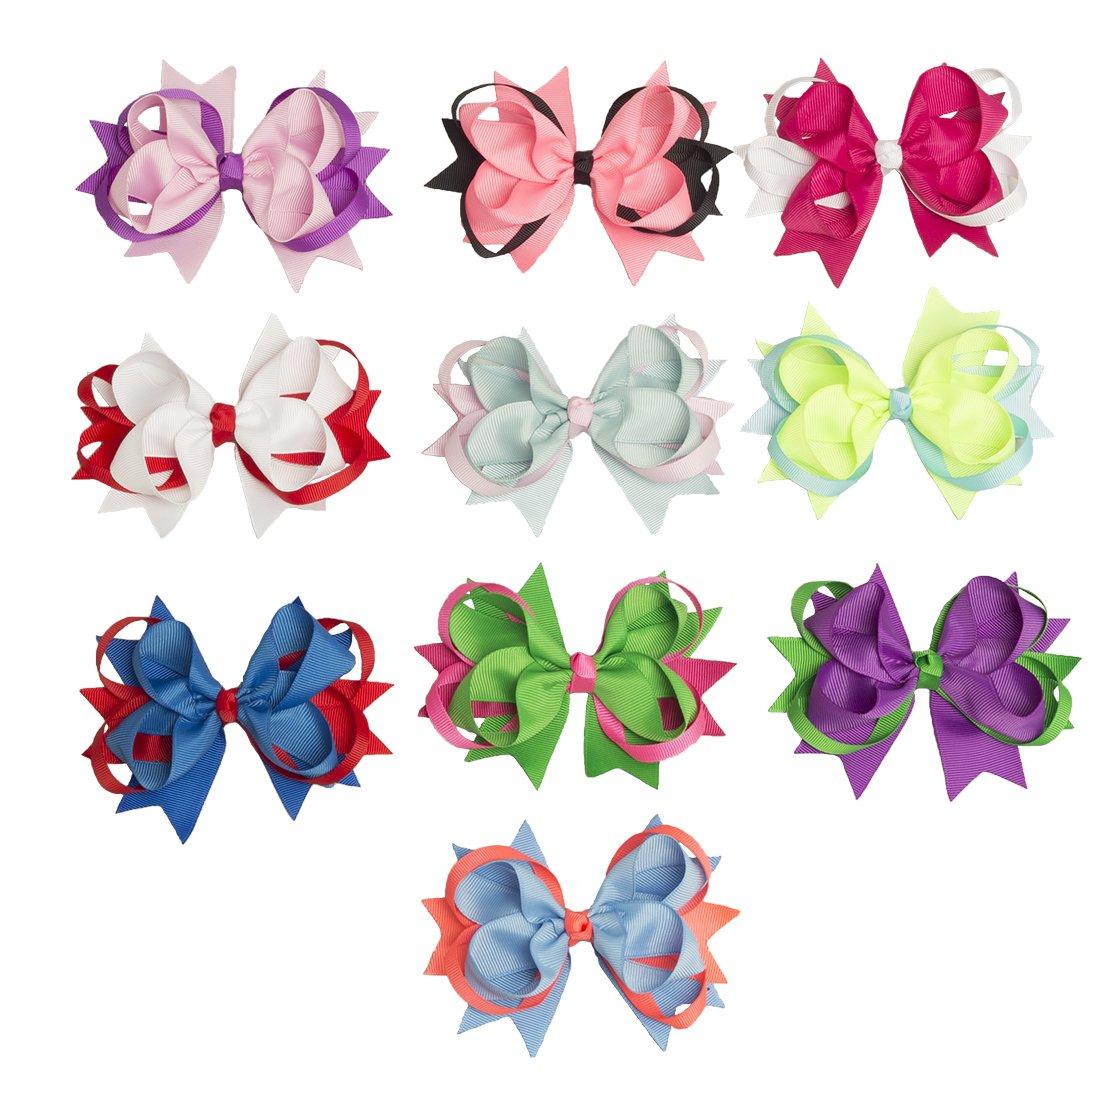 Elastics Hair Bows Ties—Aieasyda Grosgrain Ribbon Elastics Hair Bows Ties Ponytail Holder for Baby Girls Kids Teens Toddlers women (10pc-5inch-a)